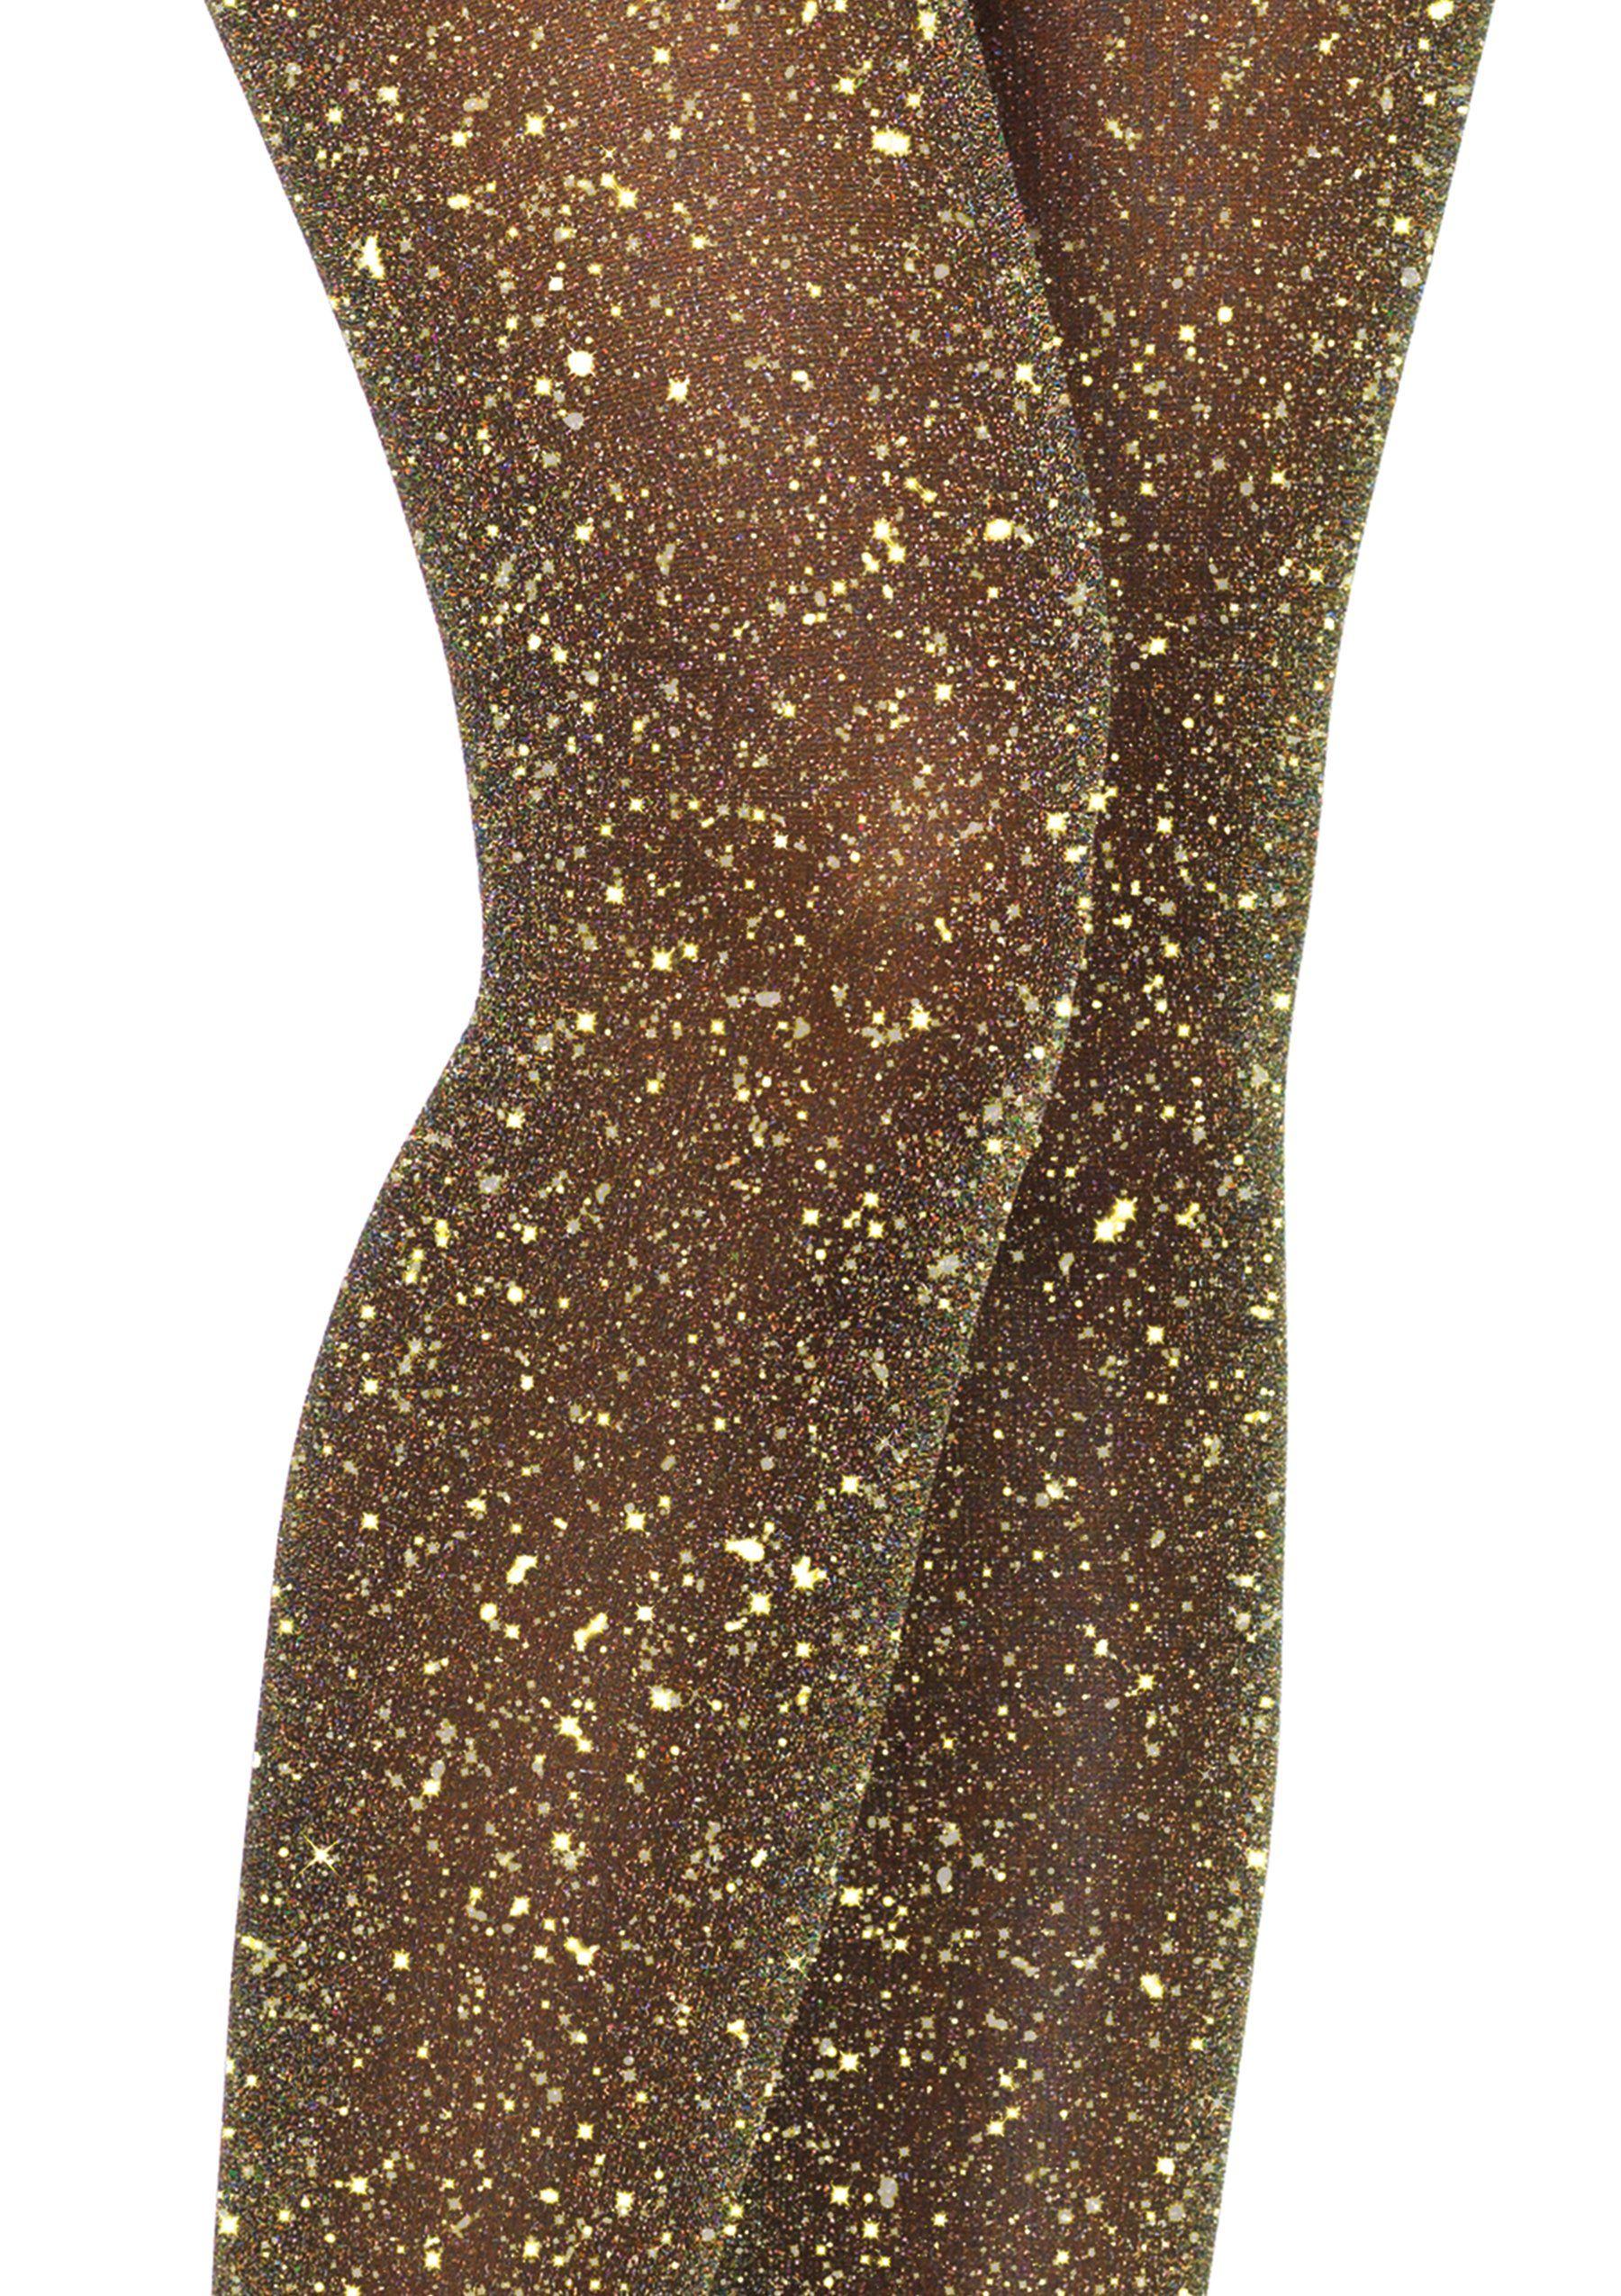 3aaa74742bab2 Leg Avenue Womens Lurex Shimmer Tights, Black/Gold #affiliate #glitter # leggings